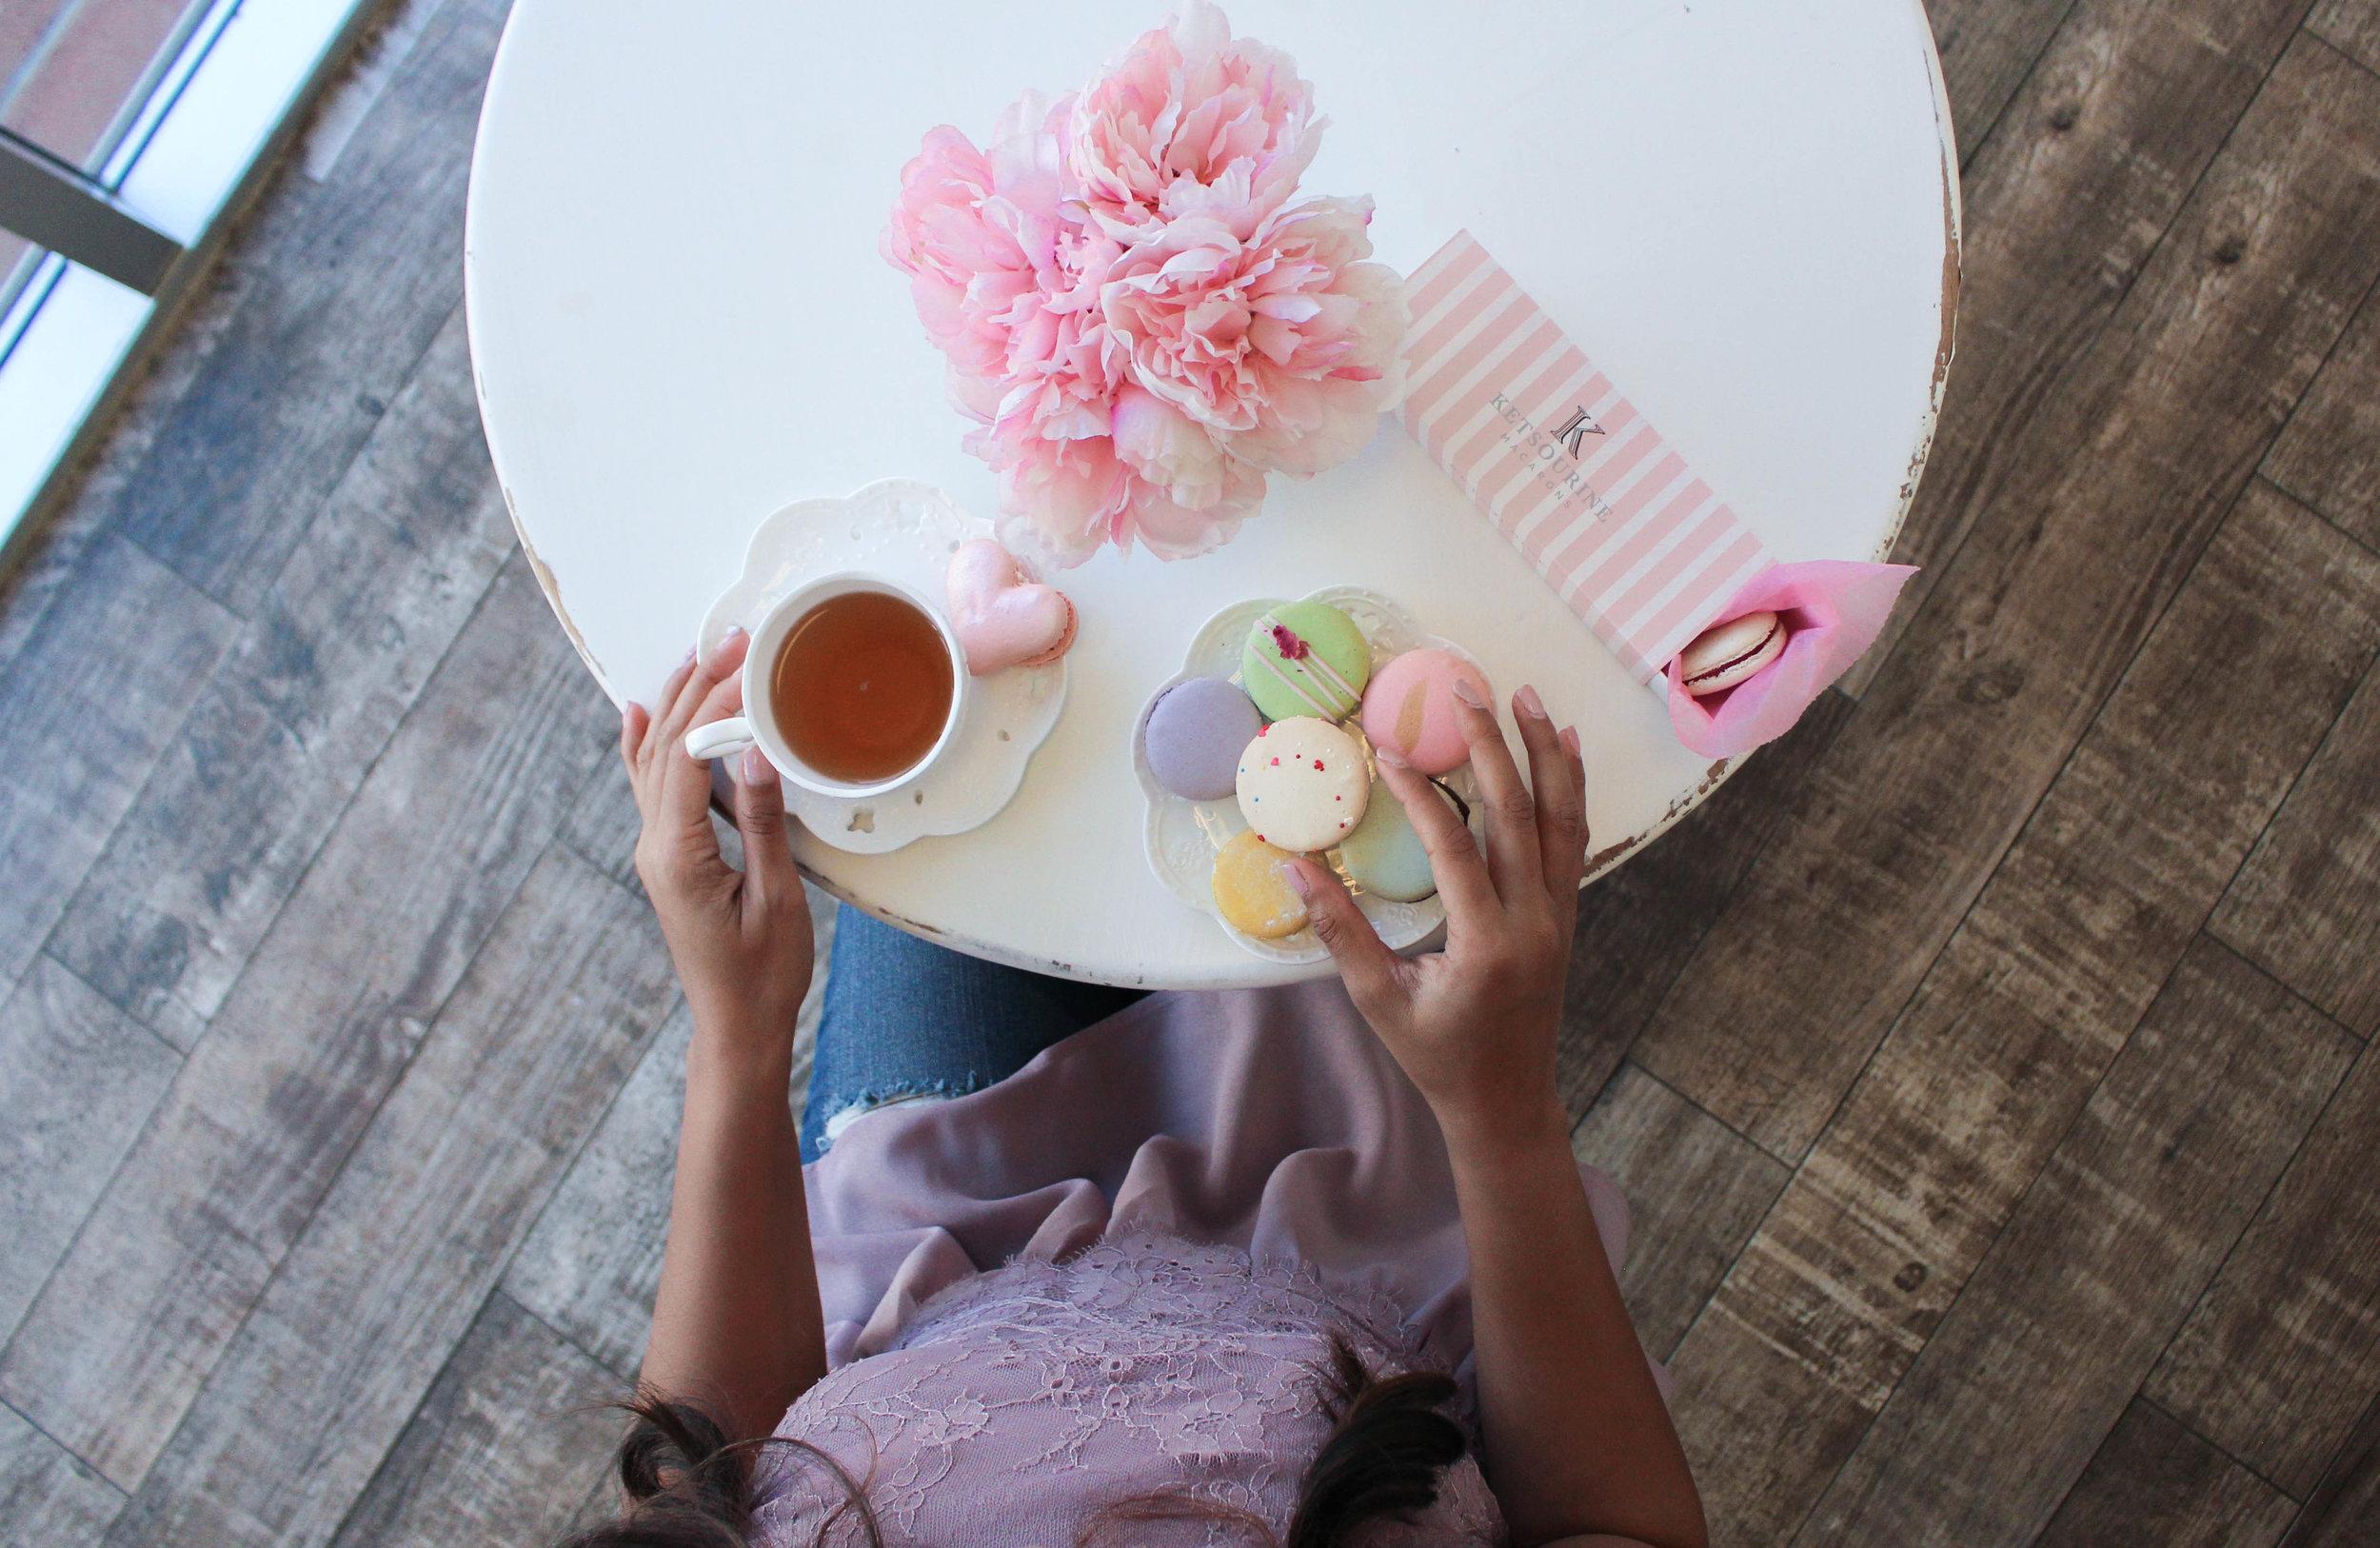 Ketsourine Macarons and tea in San Francisco